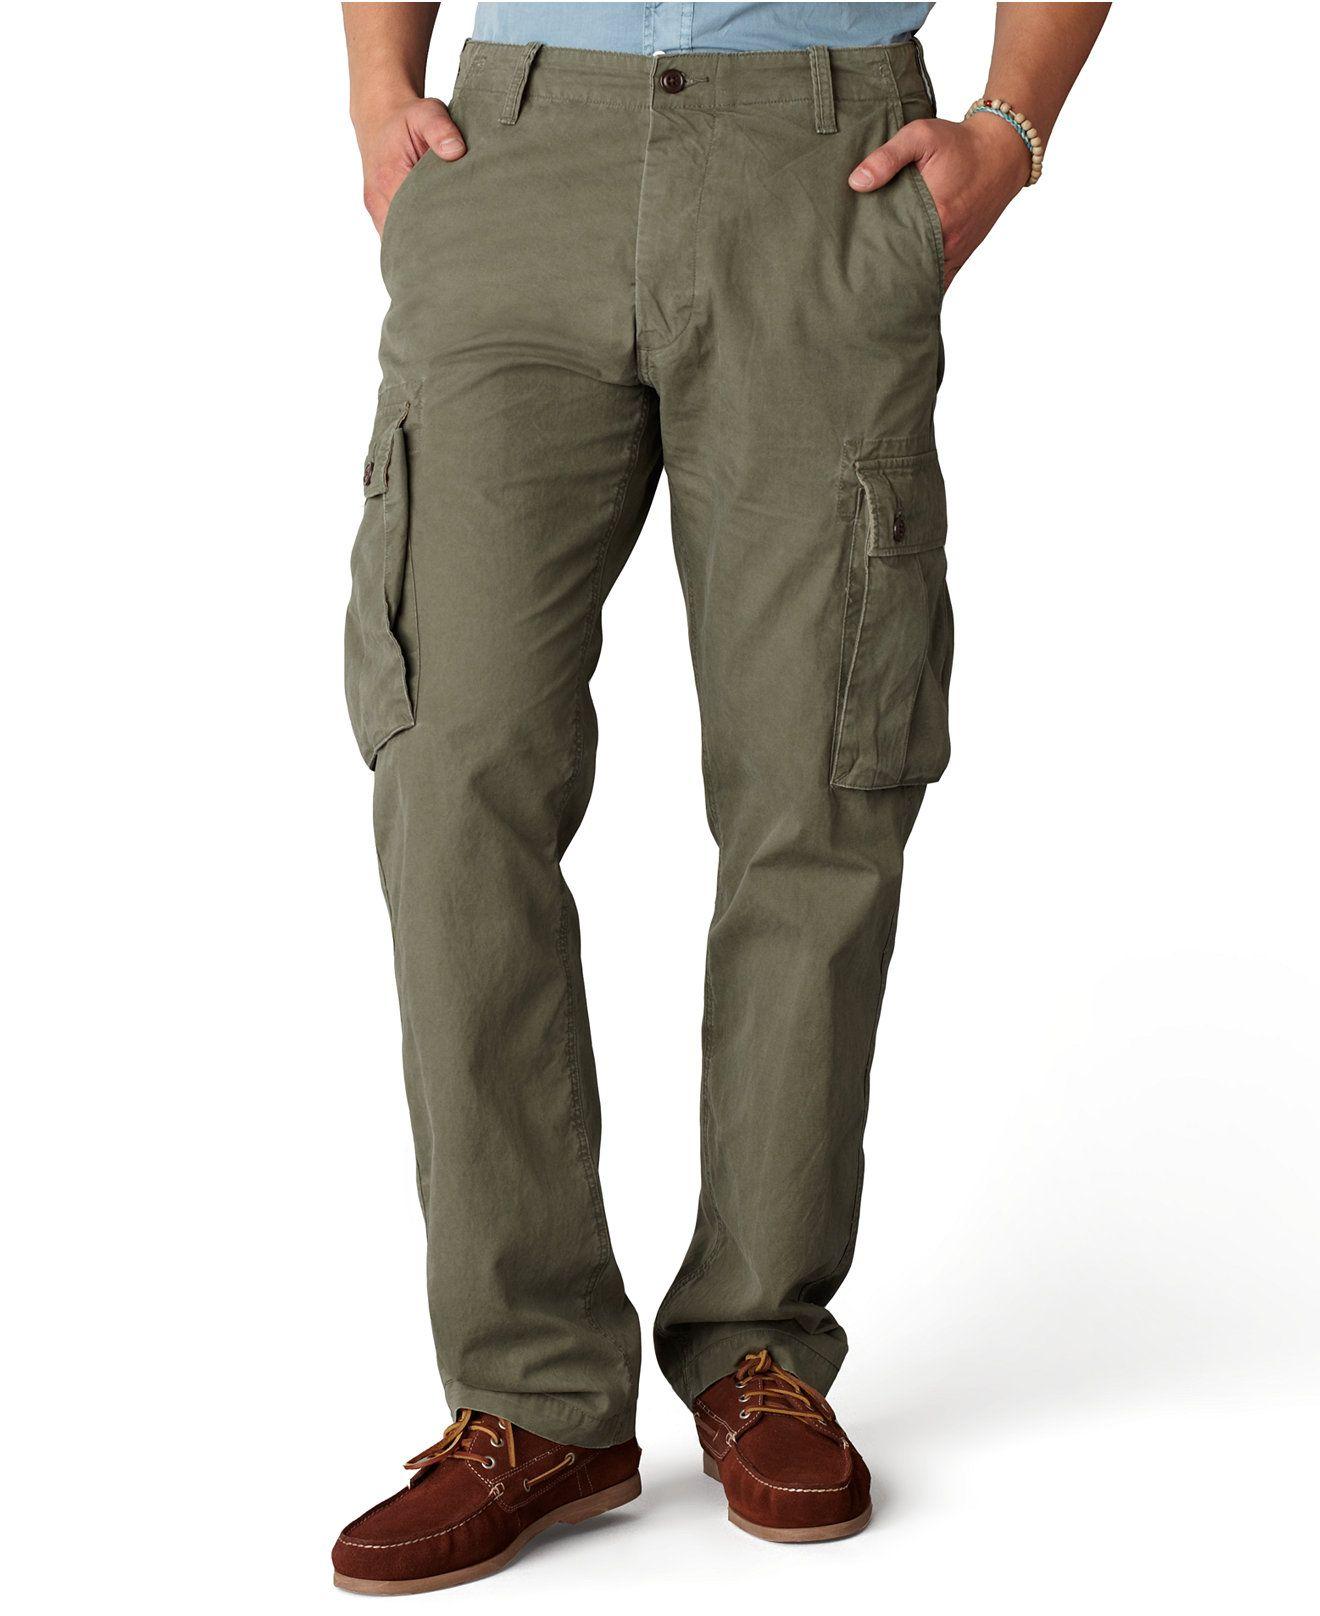 Dockers Pants, Bellowed Pocket Cargo Pants Men Macy